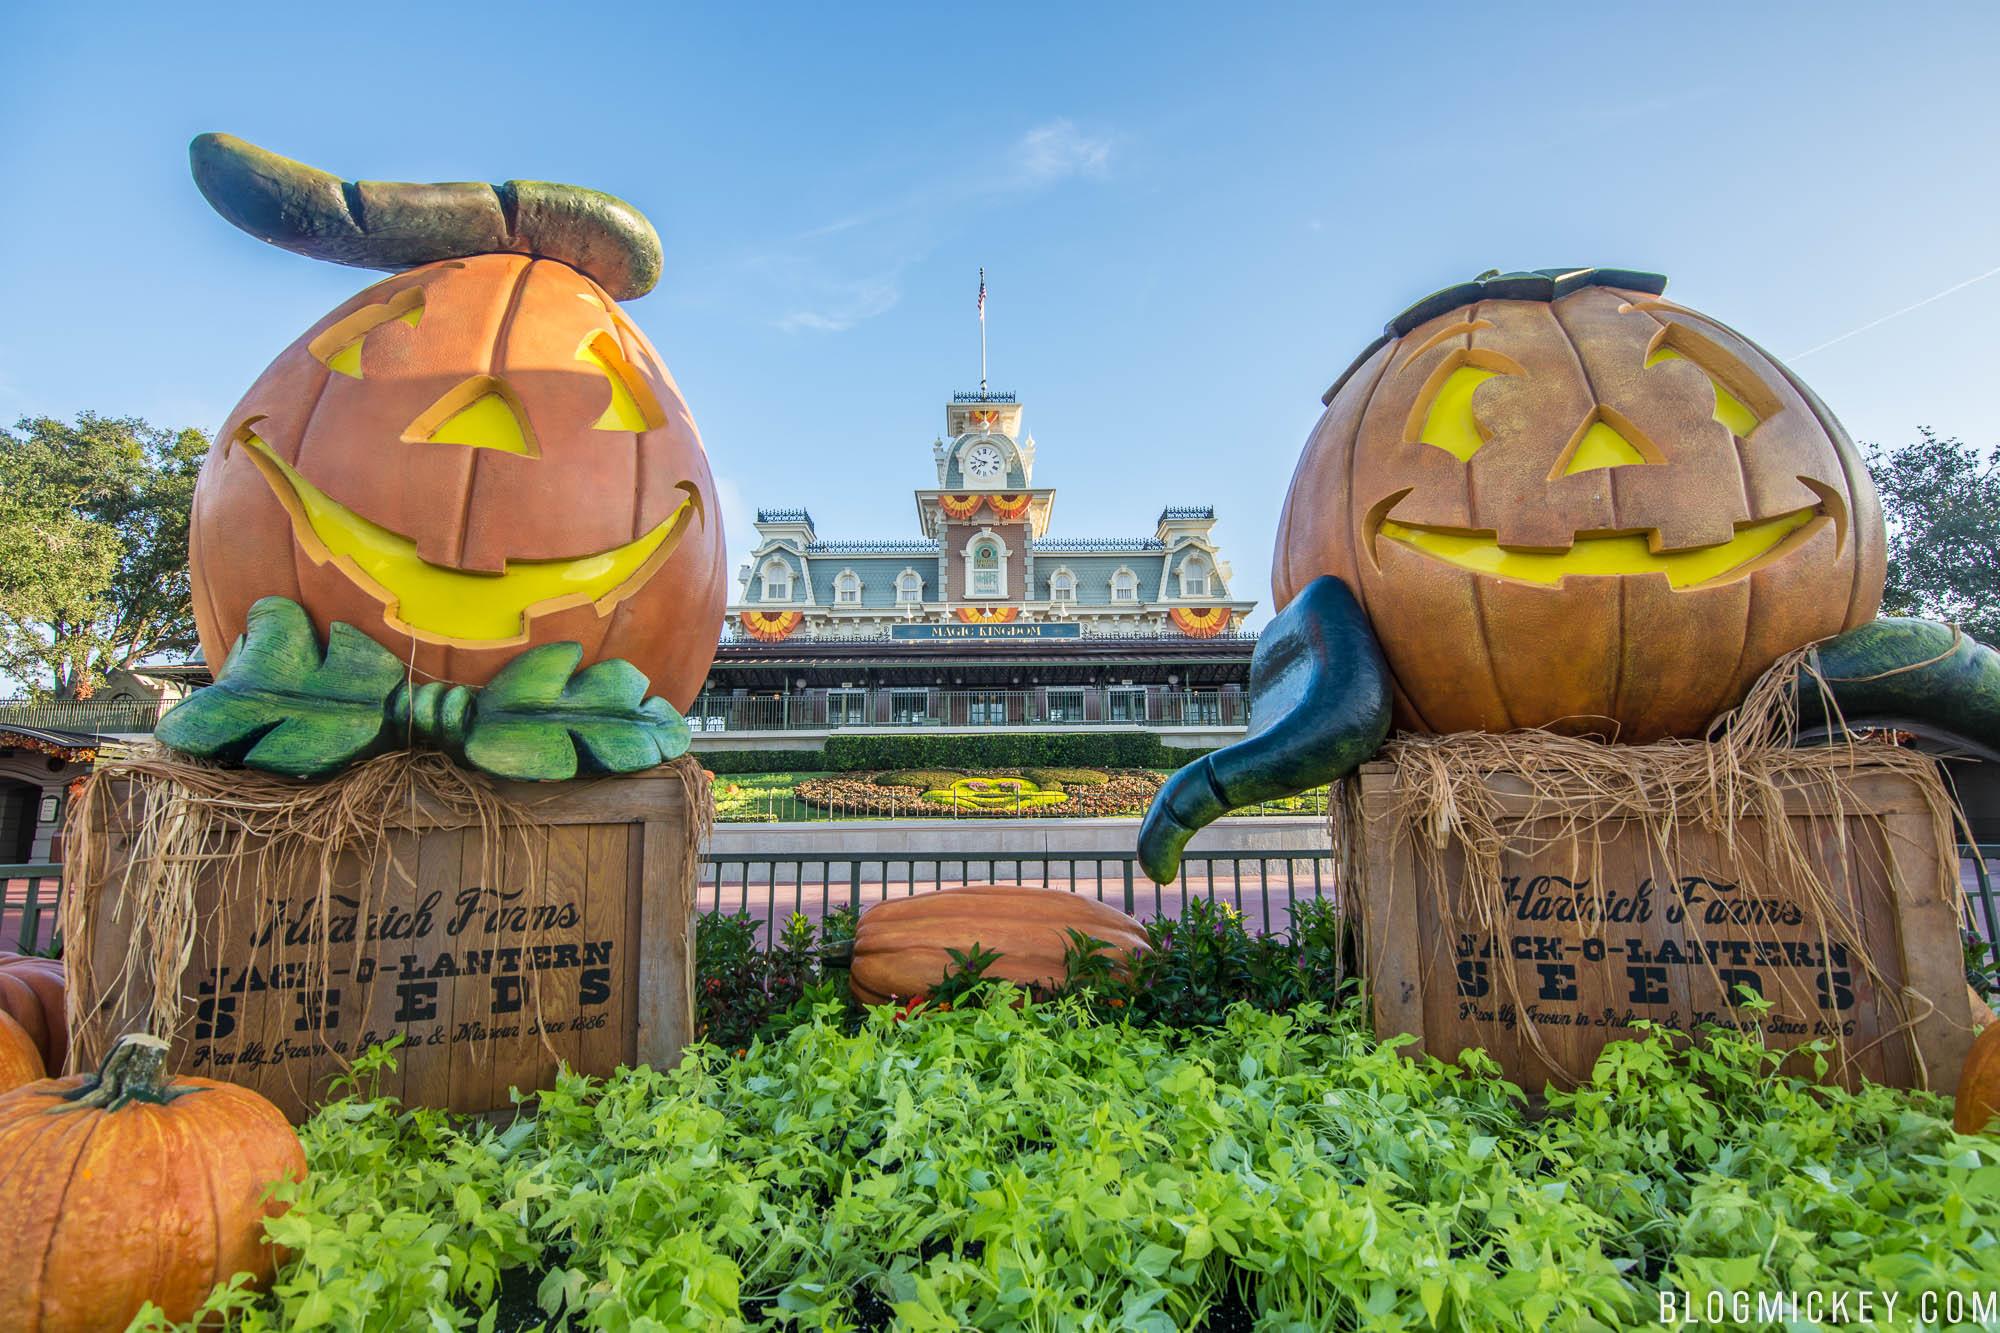 PHOTOS: Halloween Decorations Appear on Main Street USA - Blog Mickey